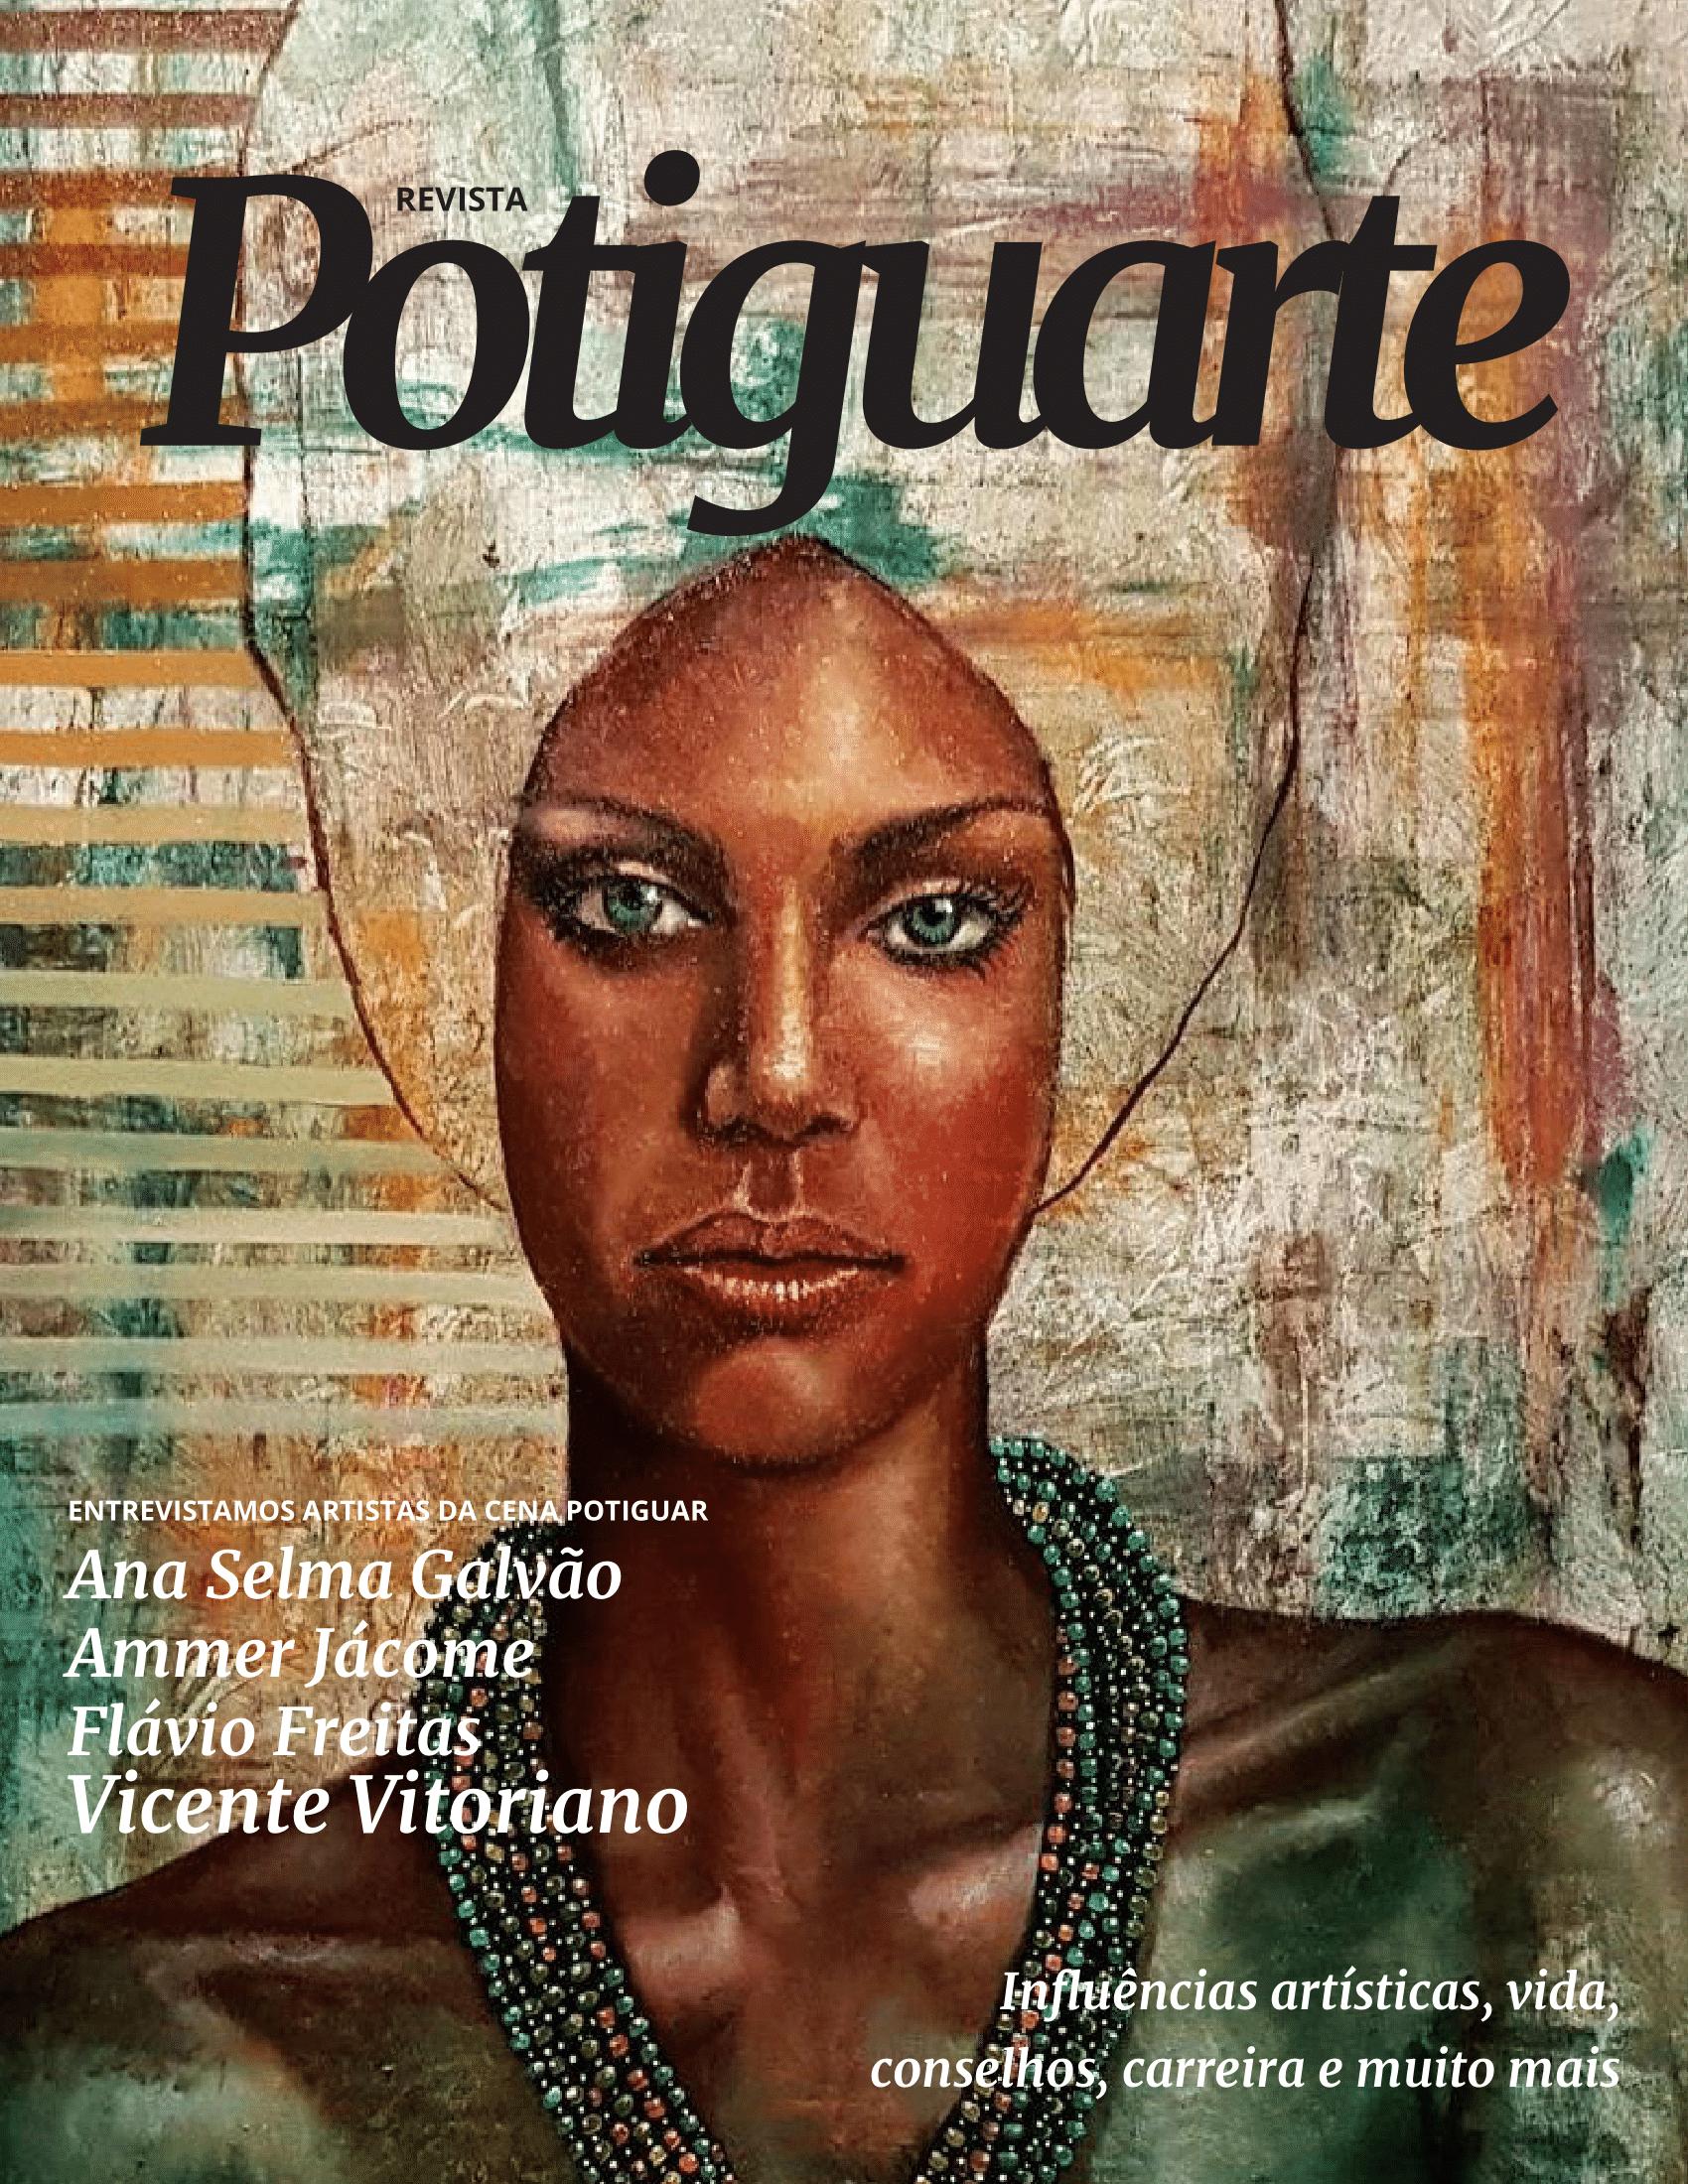 Capa da Revista Potiguarte